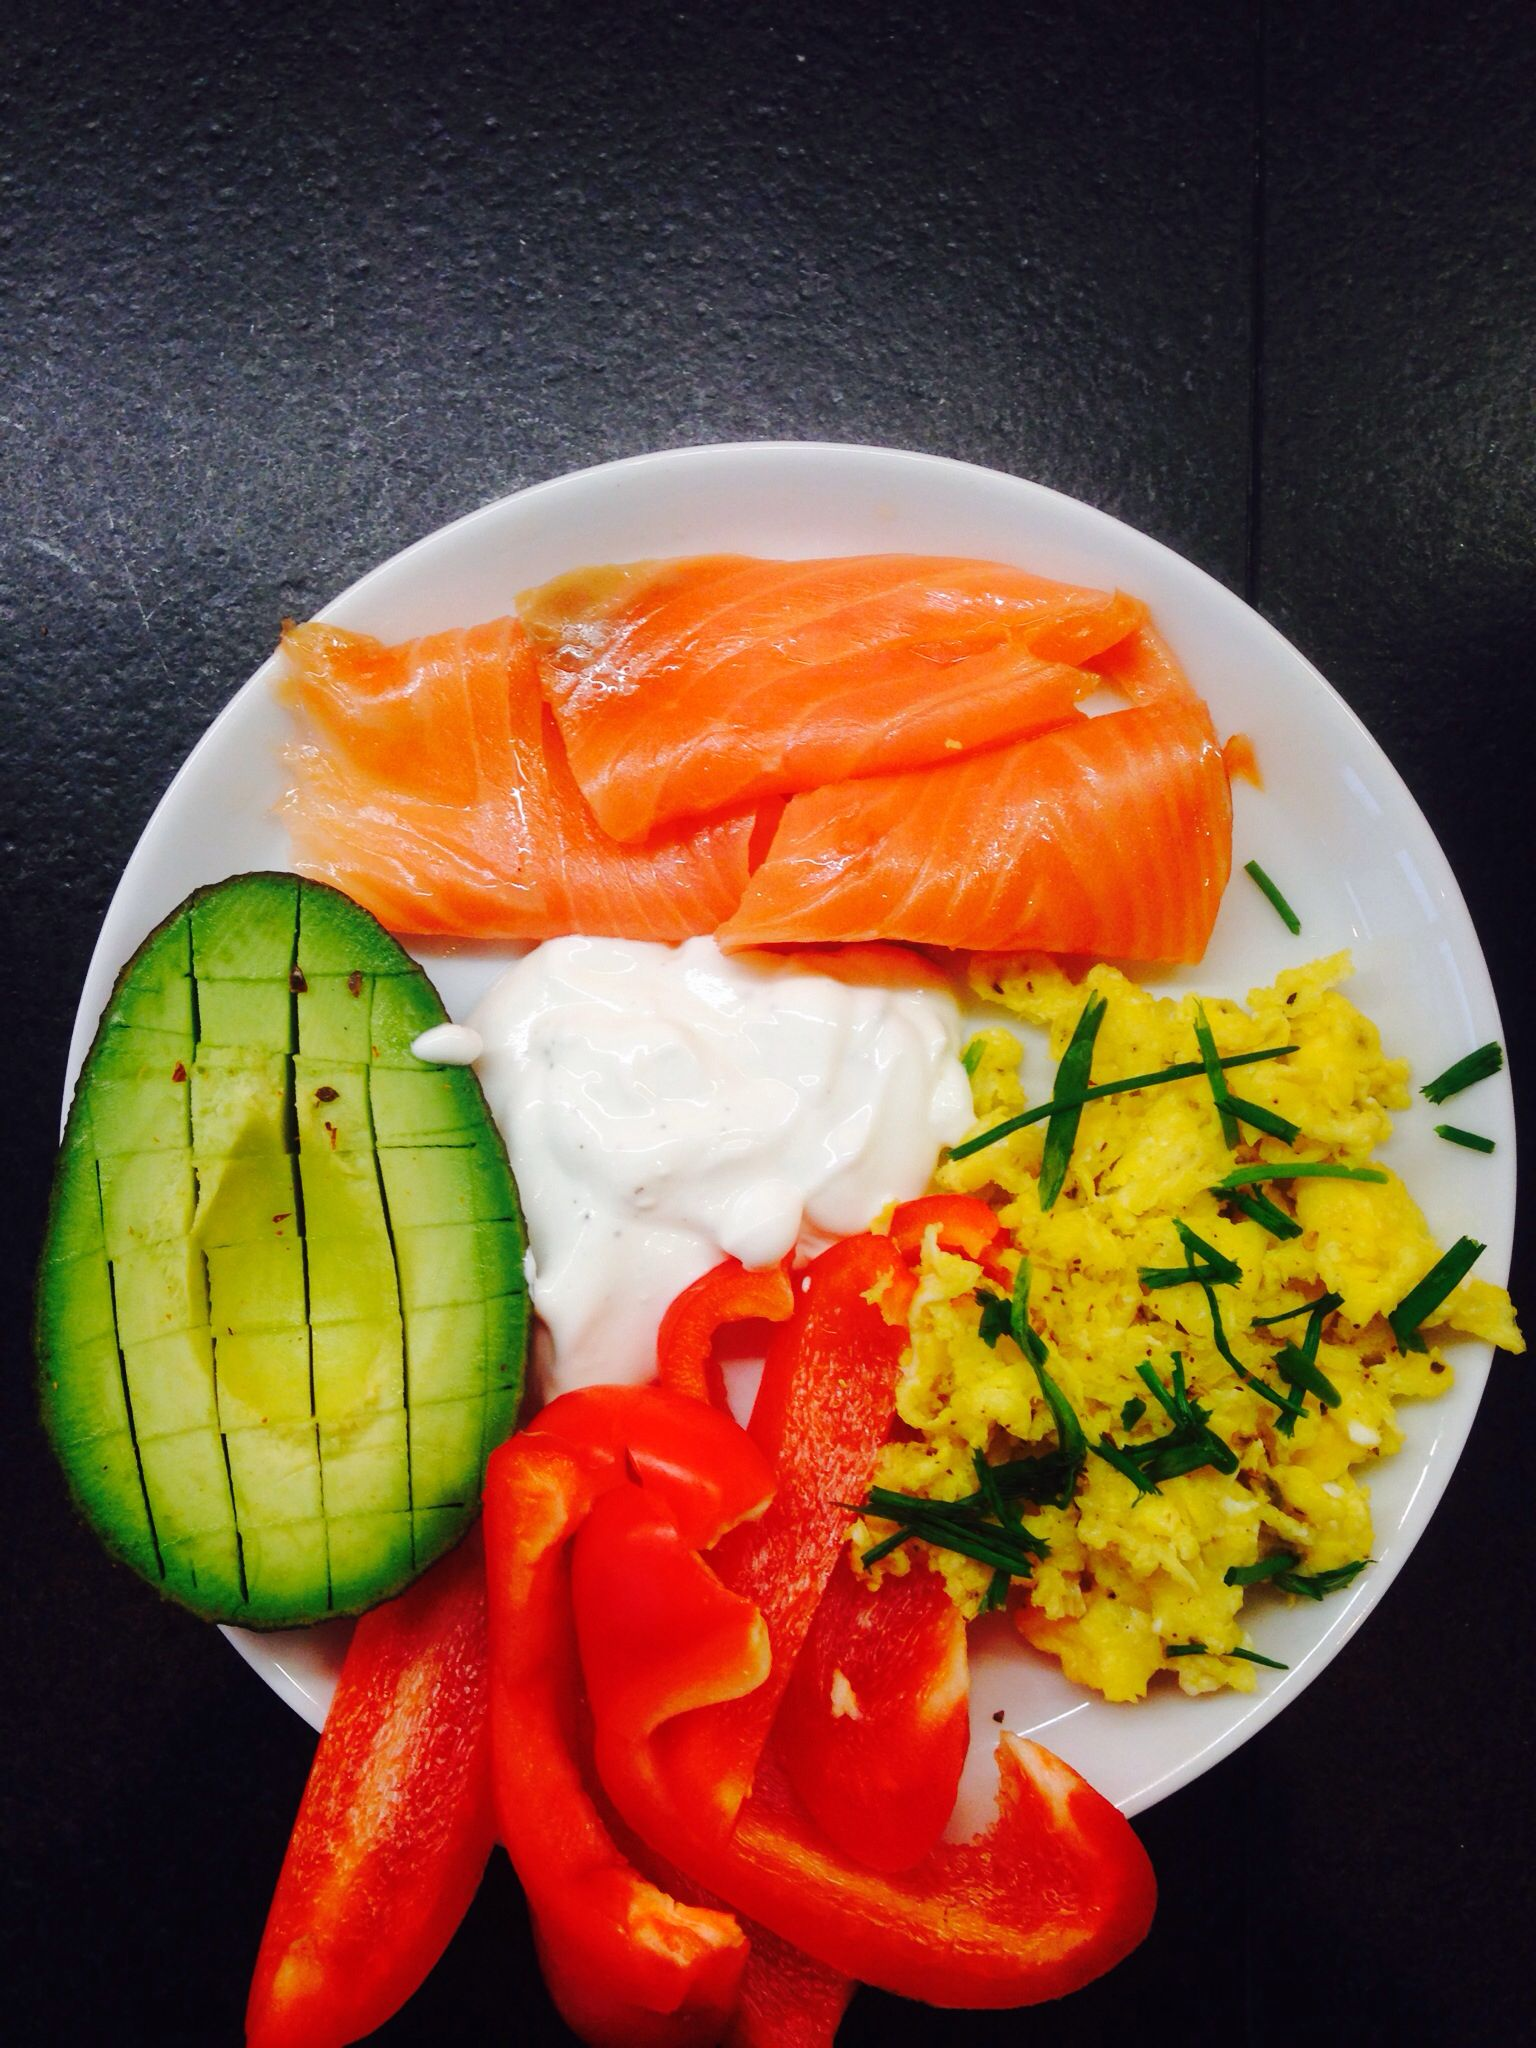 Great breakfast - no Carbs - Avocado salmon pepper eggs! Love